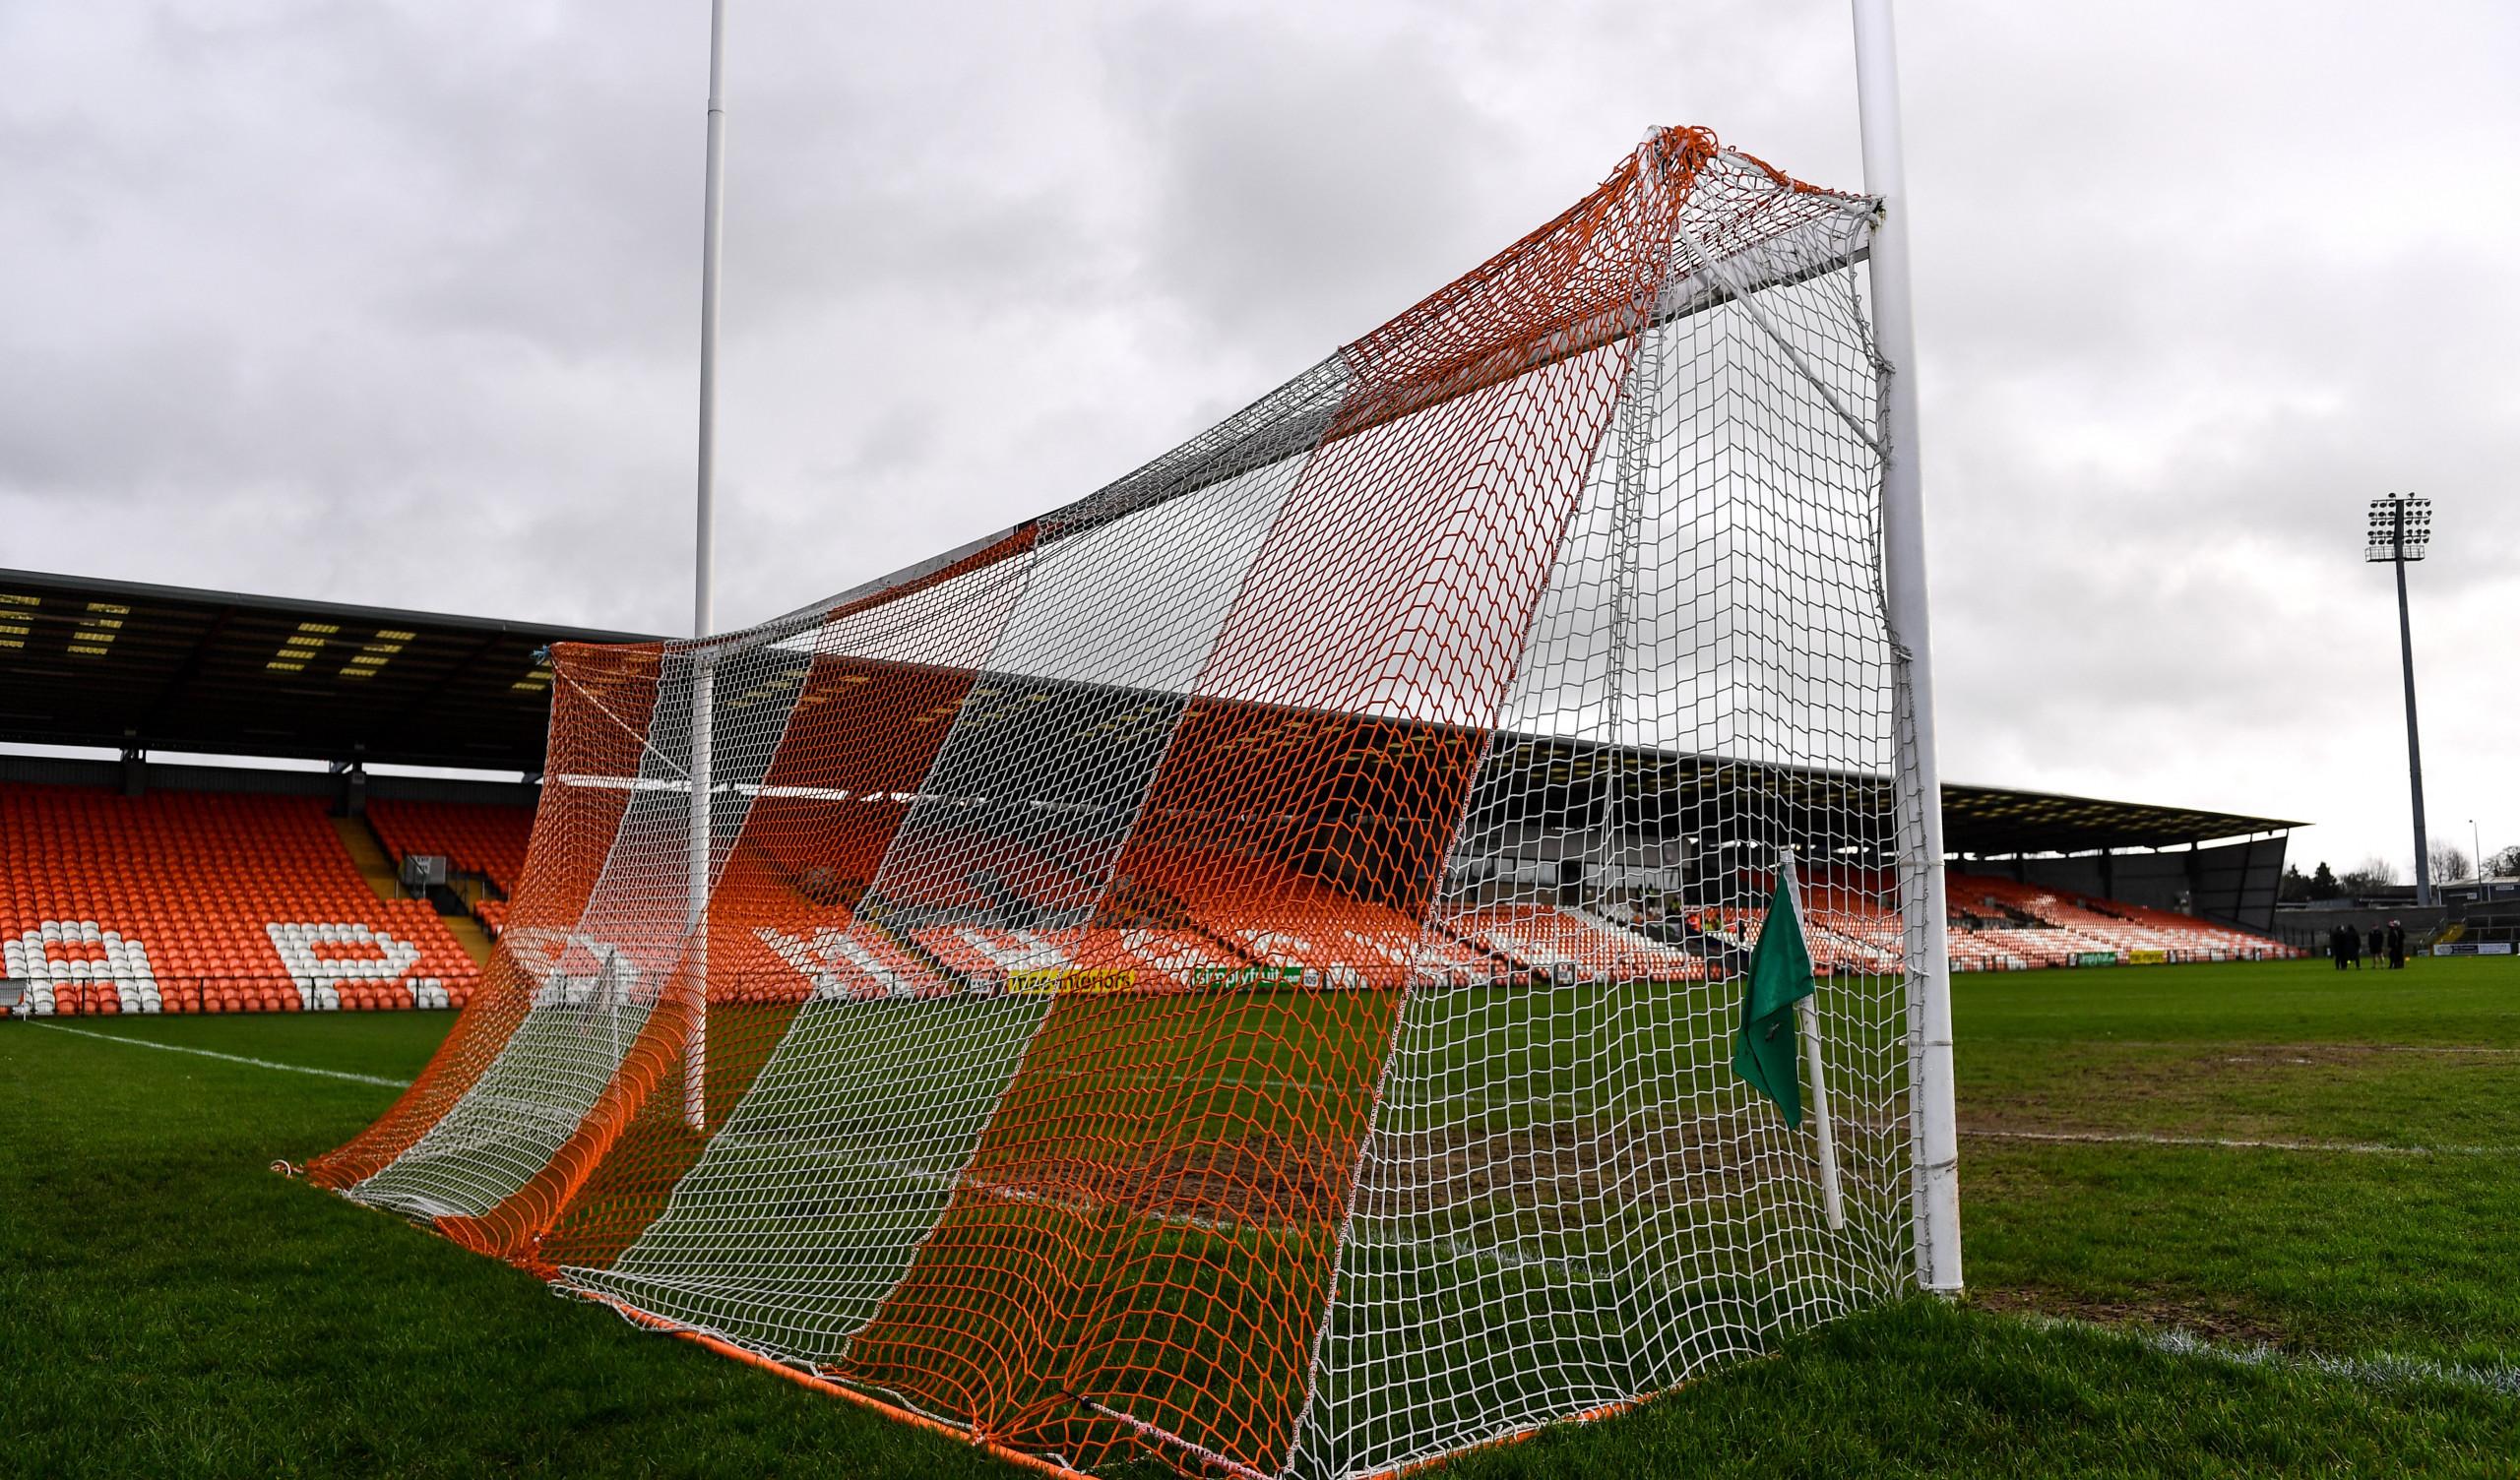 Ulster SFC Semi Final preview: Cavan vs Down